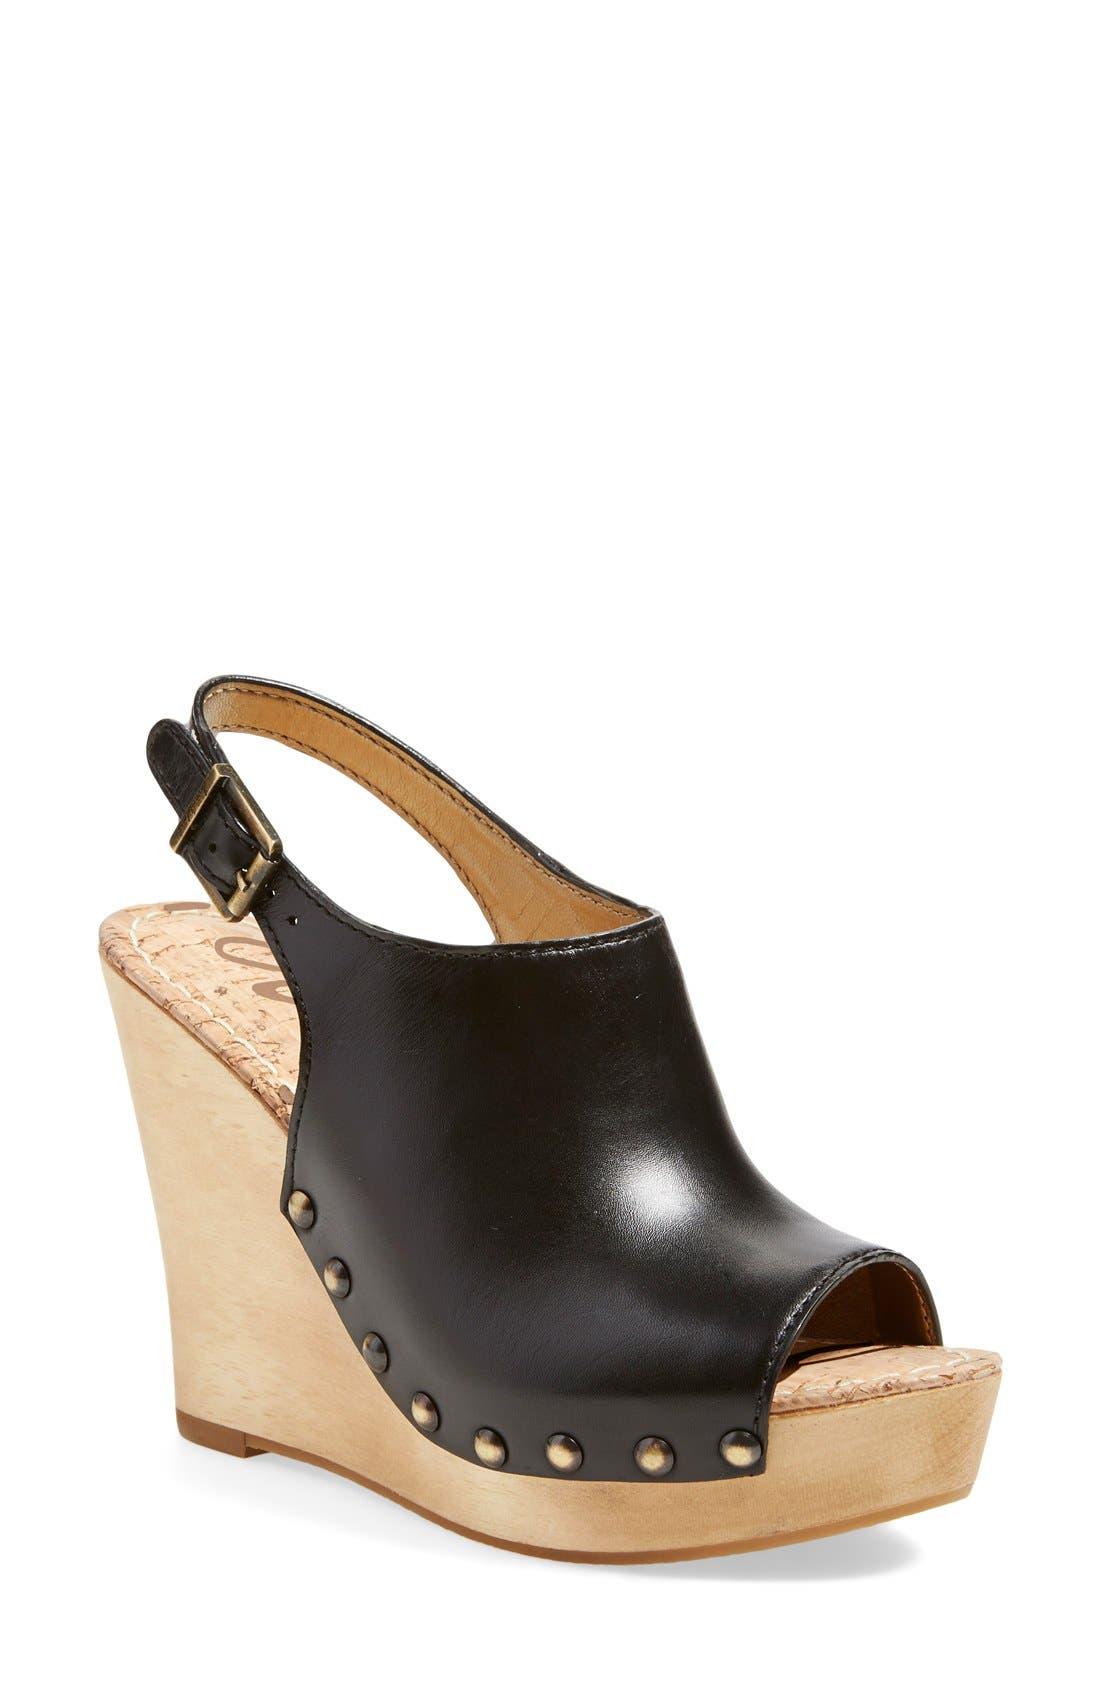 Main Image - Sam Edelman'Camilla' Wedge Sandal (Women)